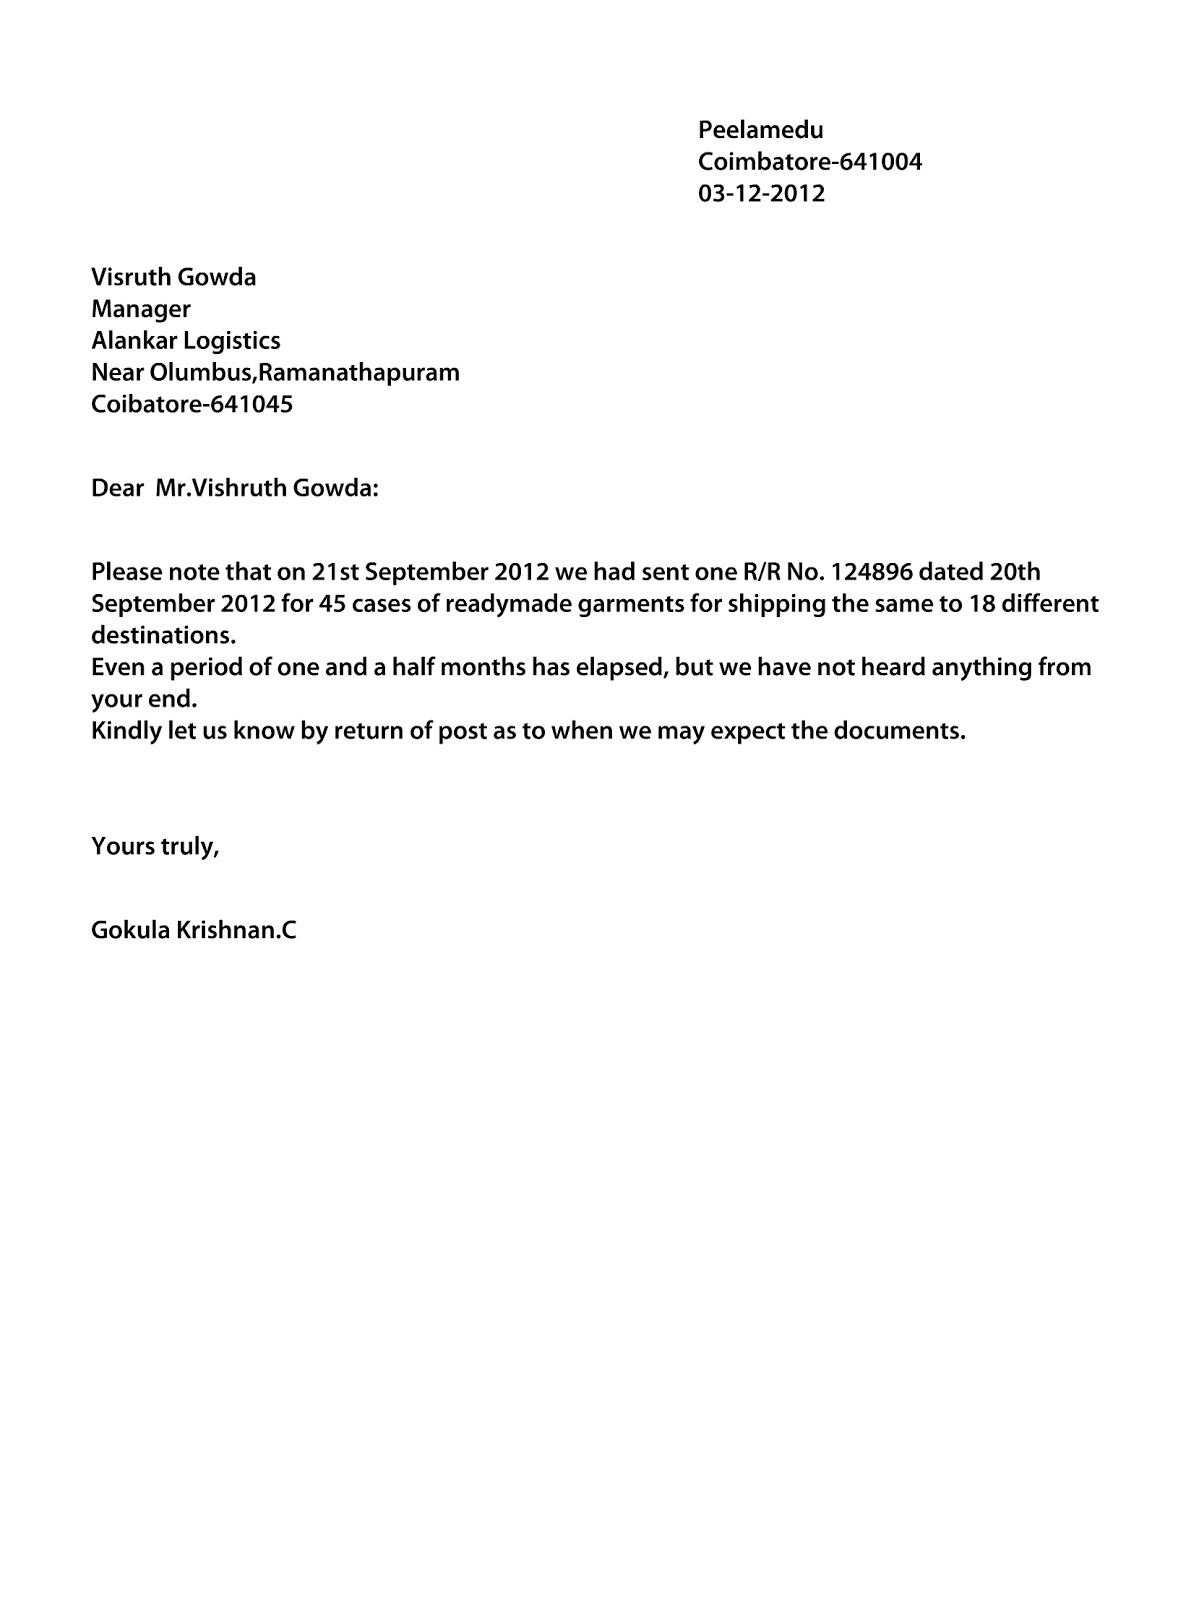 GOLDEN DAYS OF GOLD Business Letter Through Letter Generater